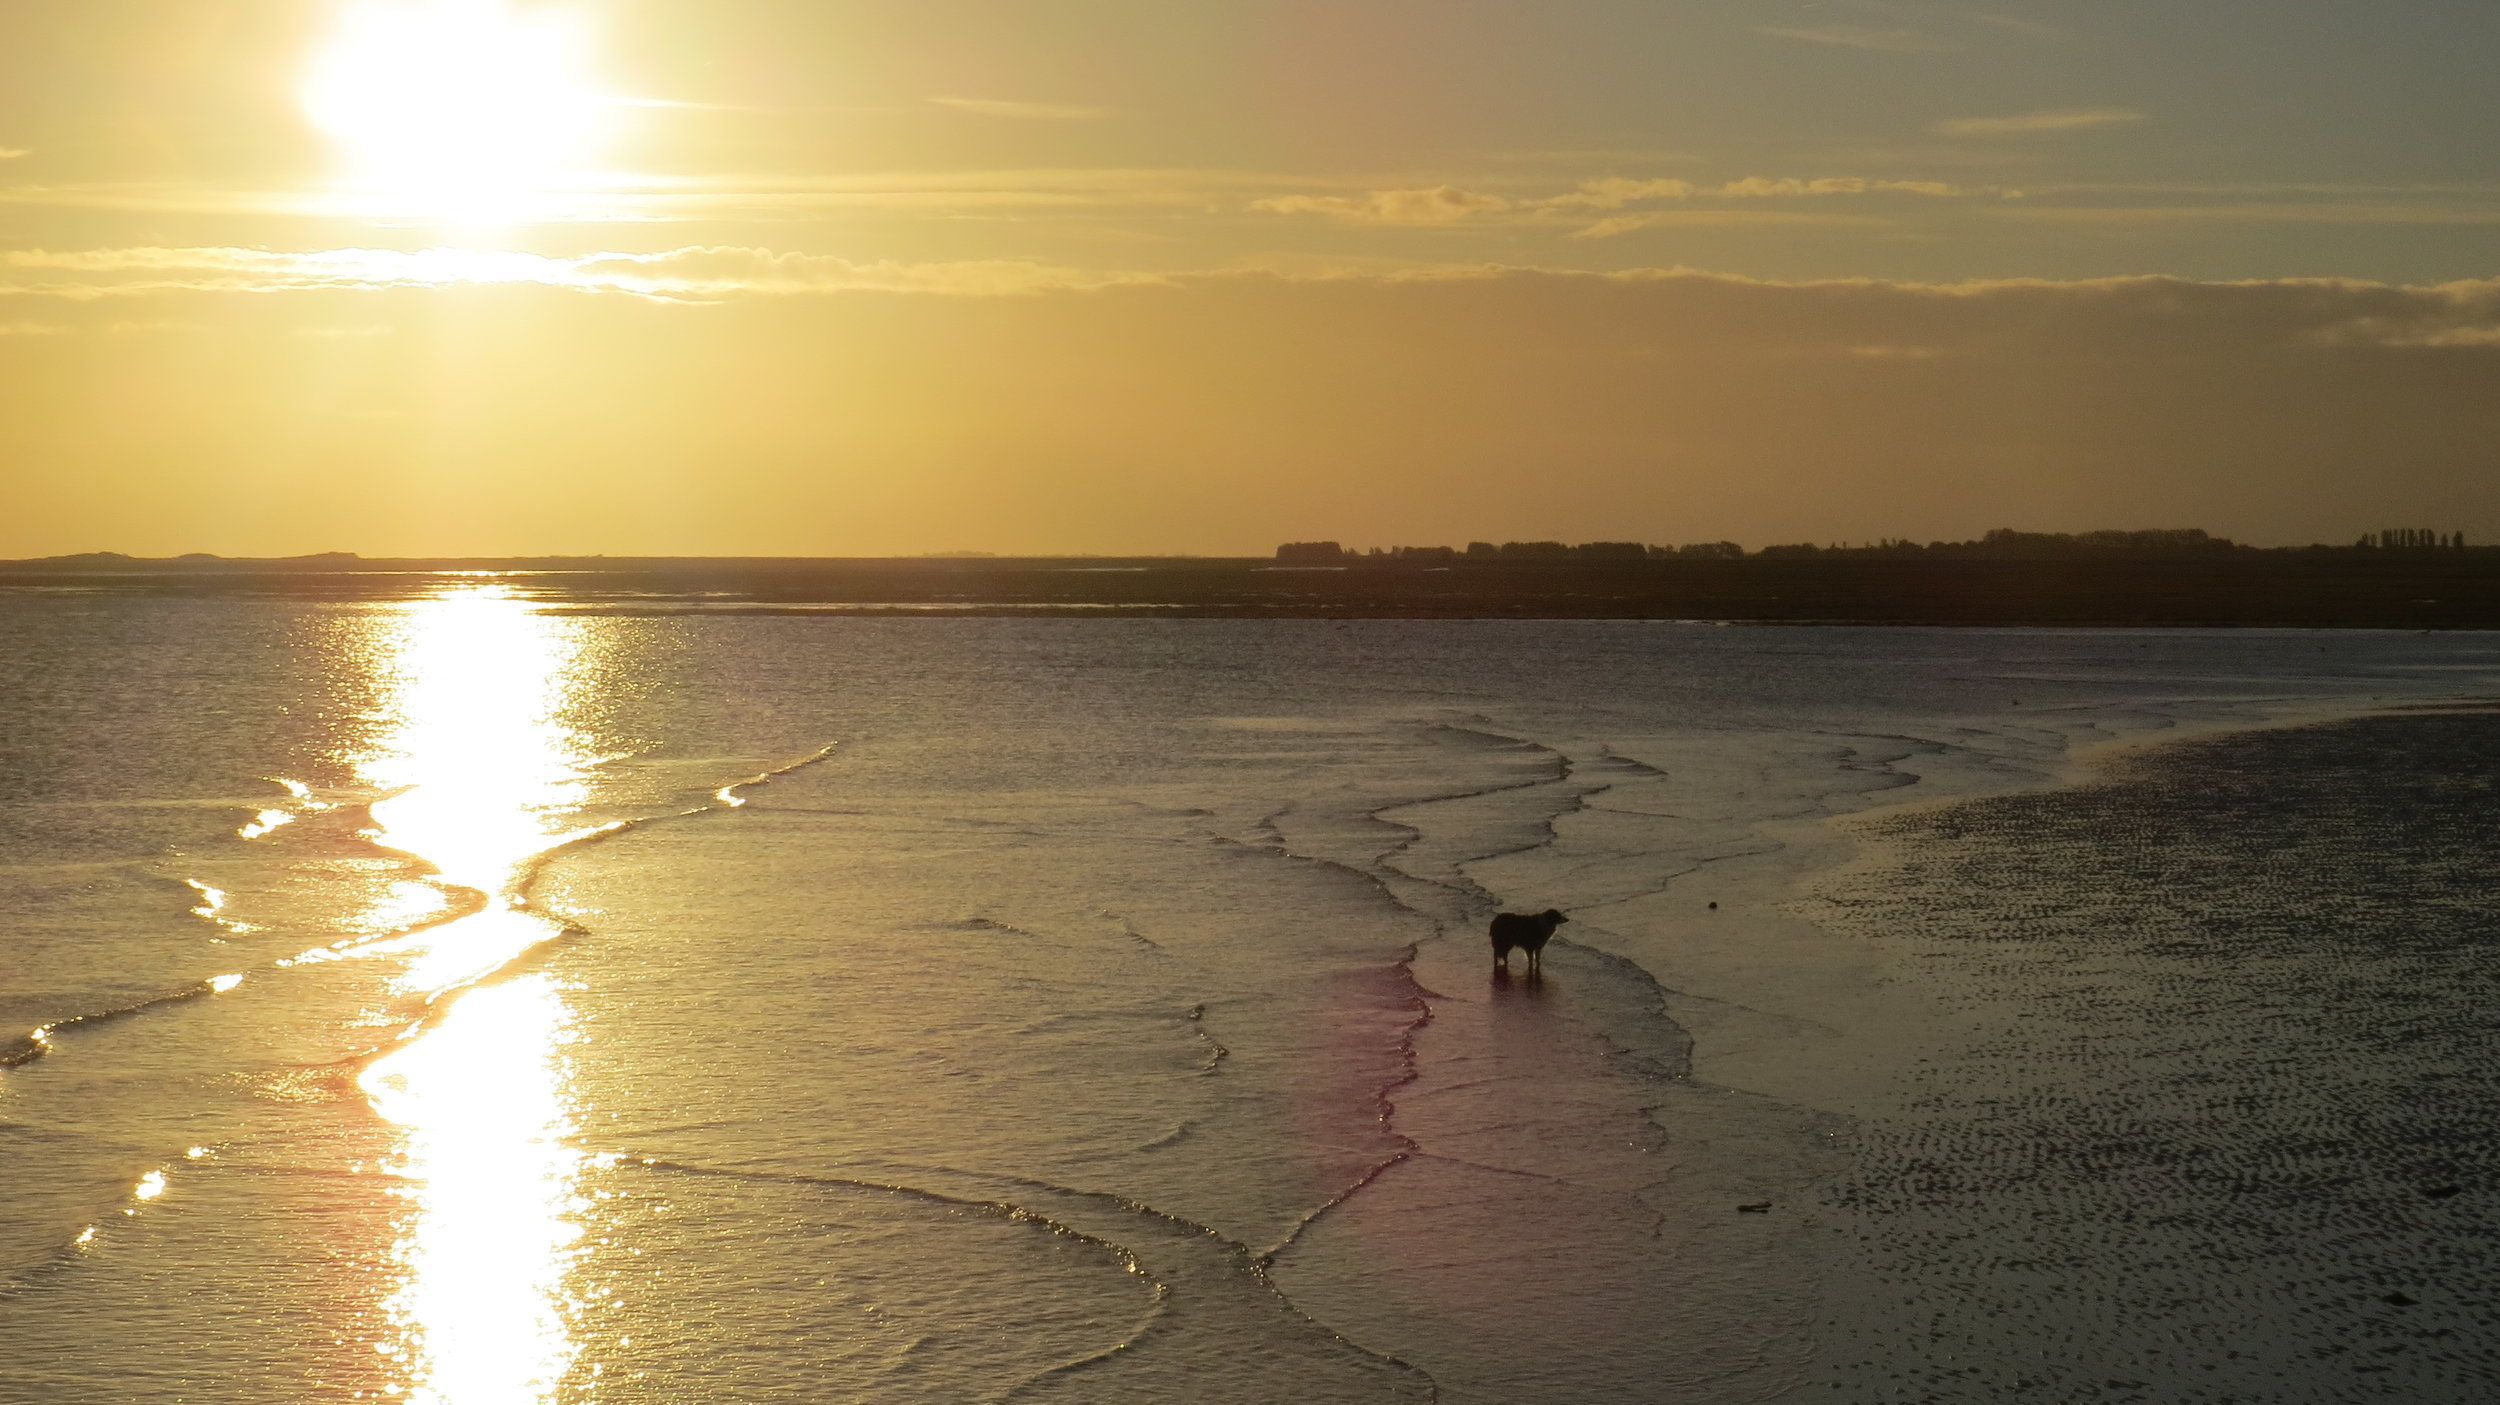 Dog enjoying the Sea